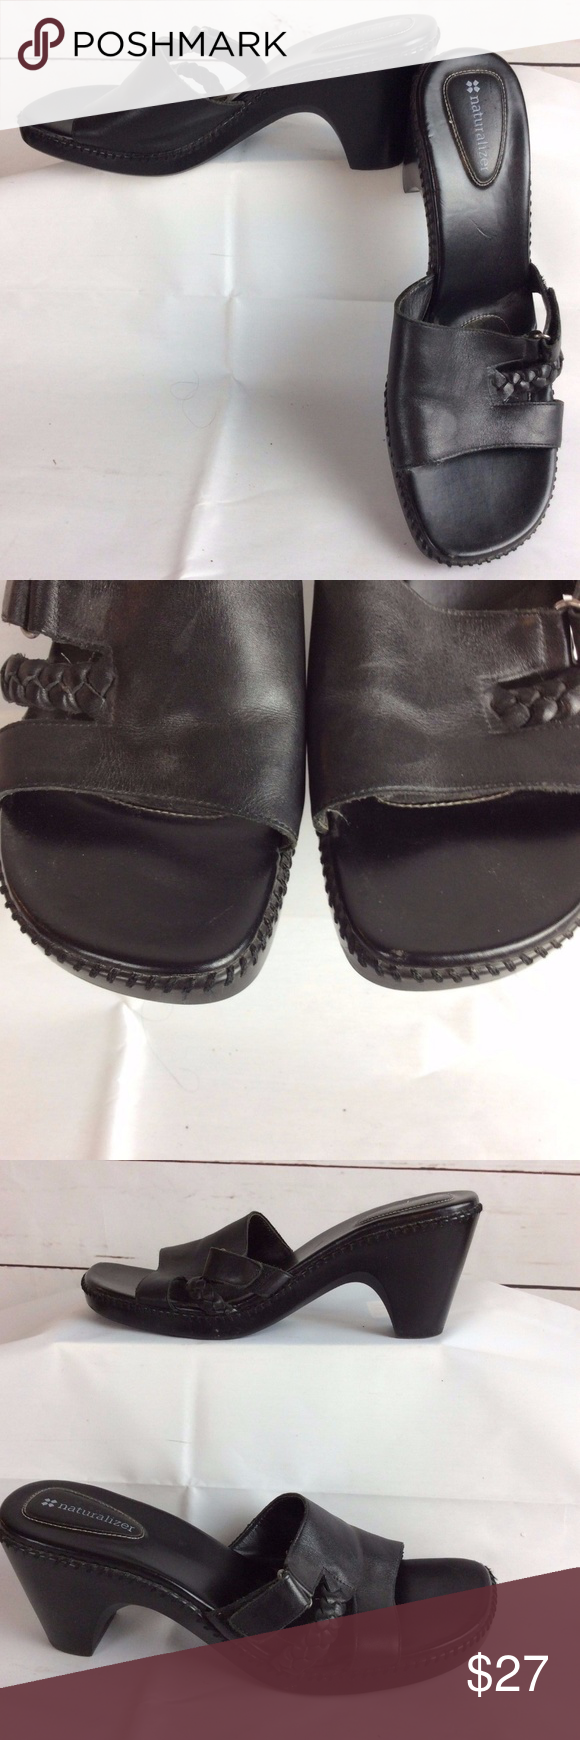 NATURALIZER Women's Black Leather Heel Sandal Shoe Black